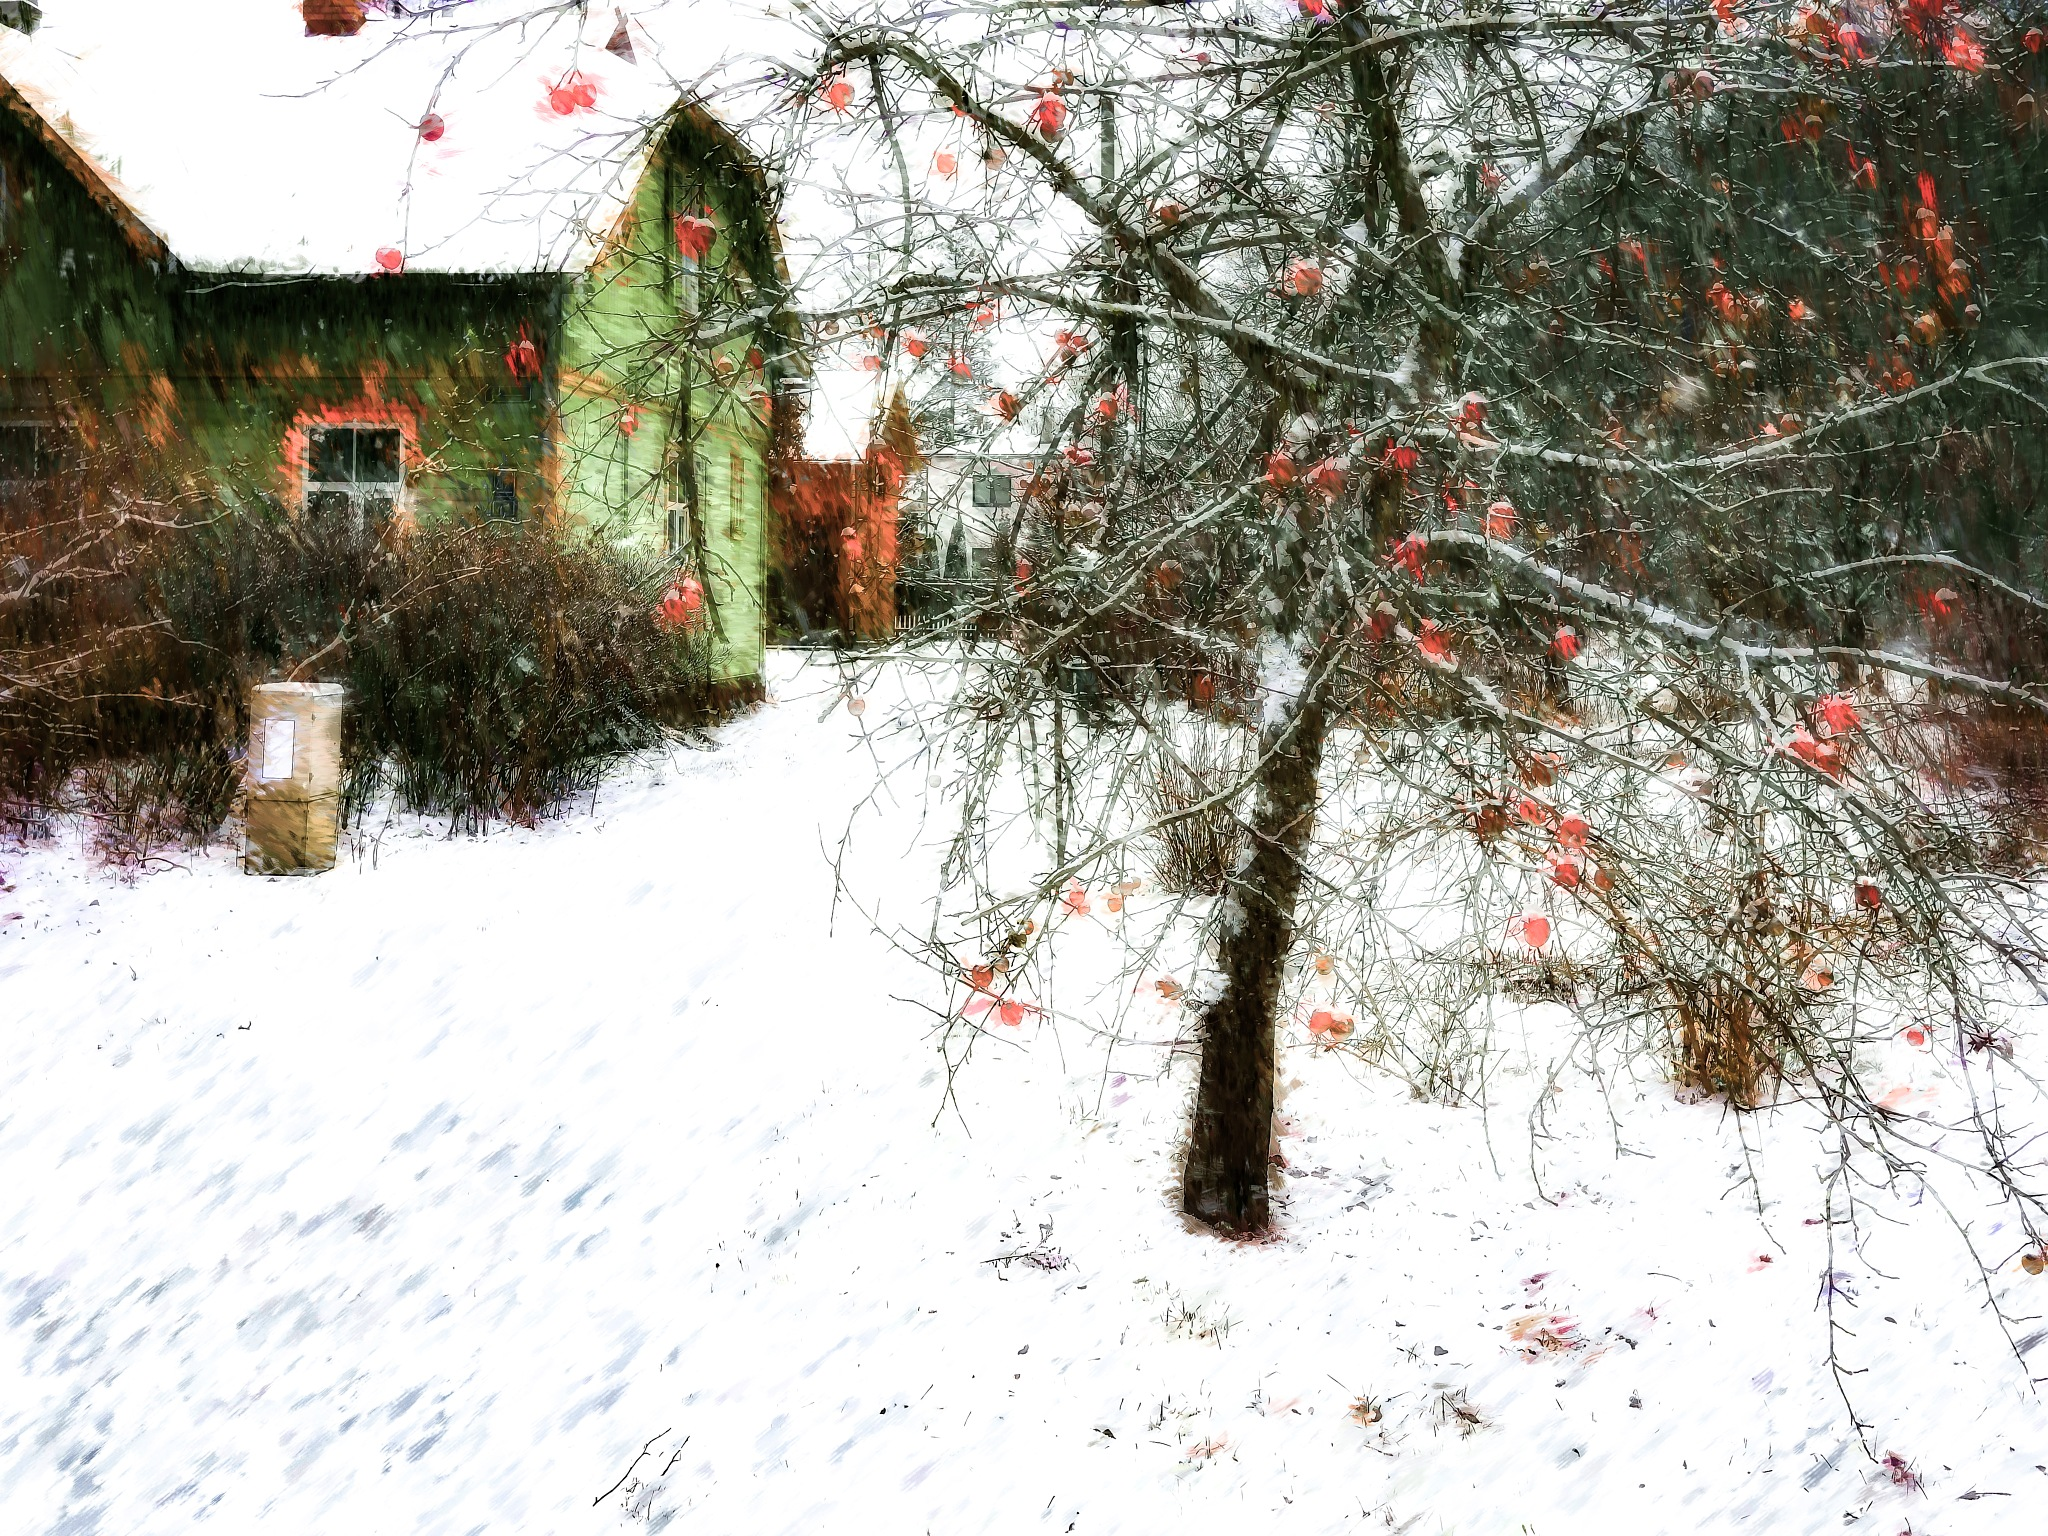 Apple & Snow by Aleksandrs Drozdovs